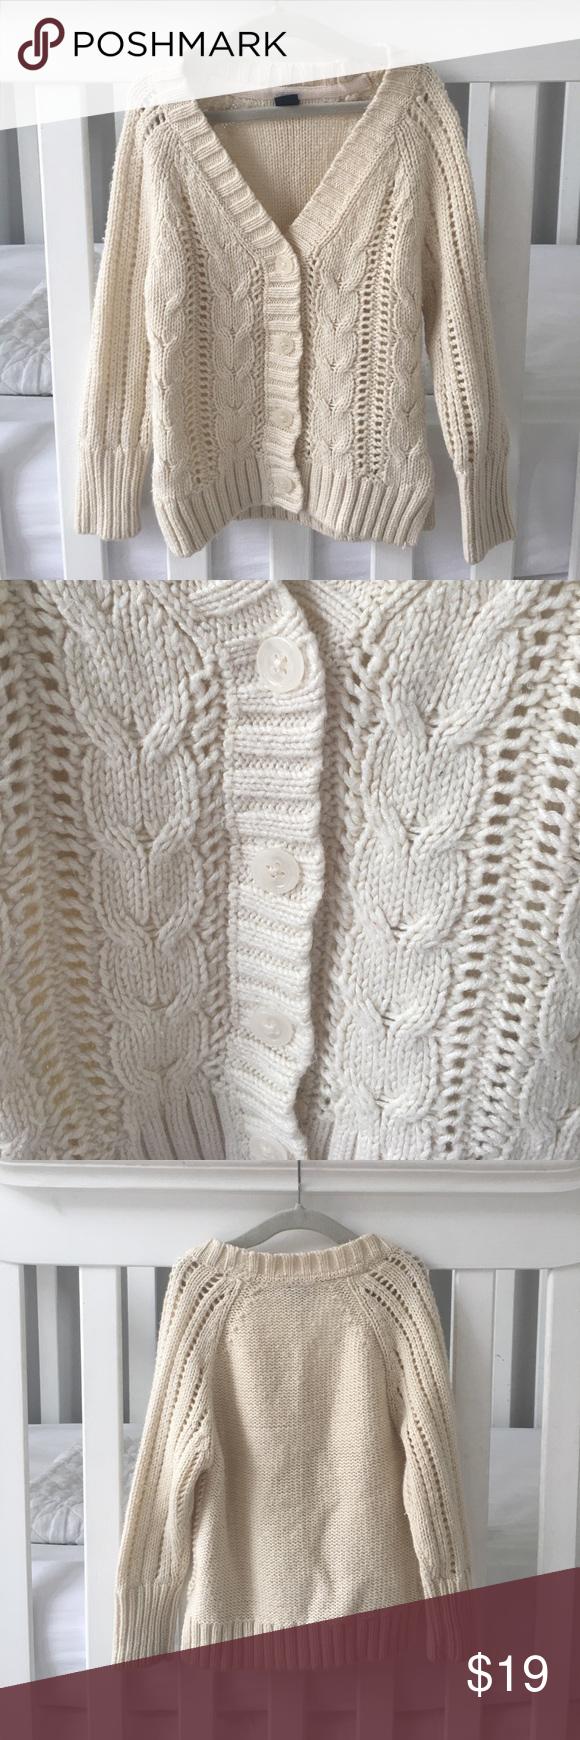 10ac1b550080 3 Years BABY GAP KNIT CARDIGAN BabyGap size 3 years knit cardigan ...